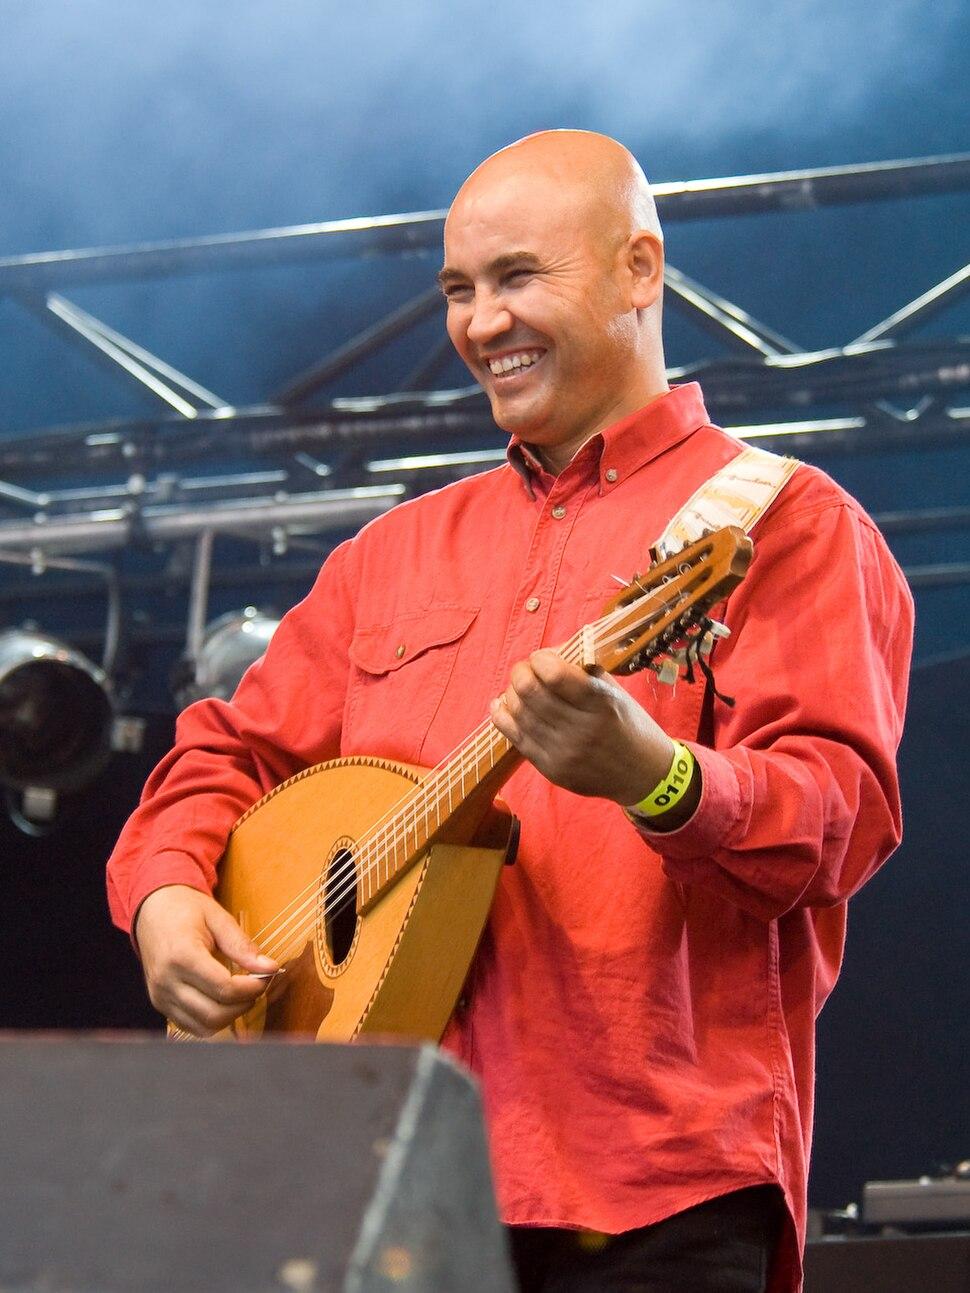 Abderrahmane Abdelli